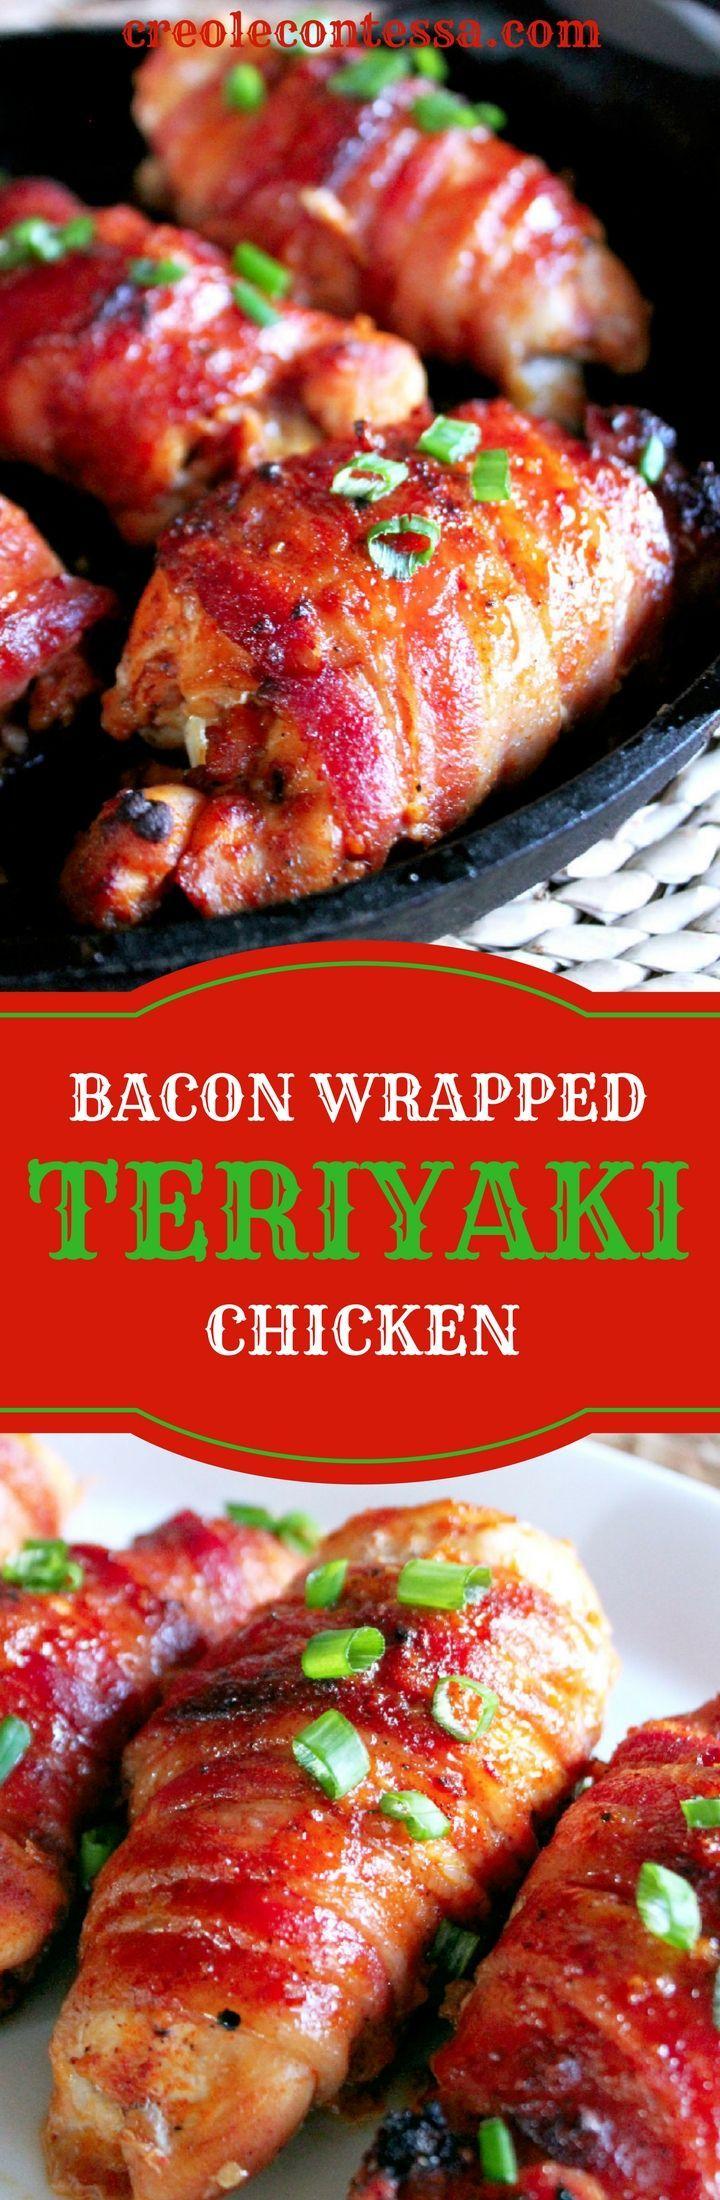 Bacon Wrapped Teriyaki Chicken with Kikkoman-Creole Contessa #ad /kikkoma/